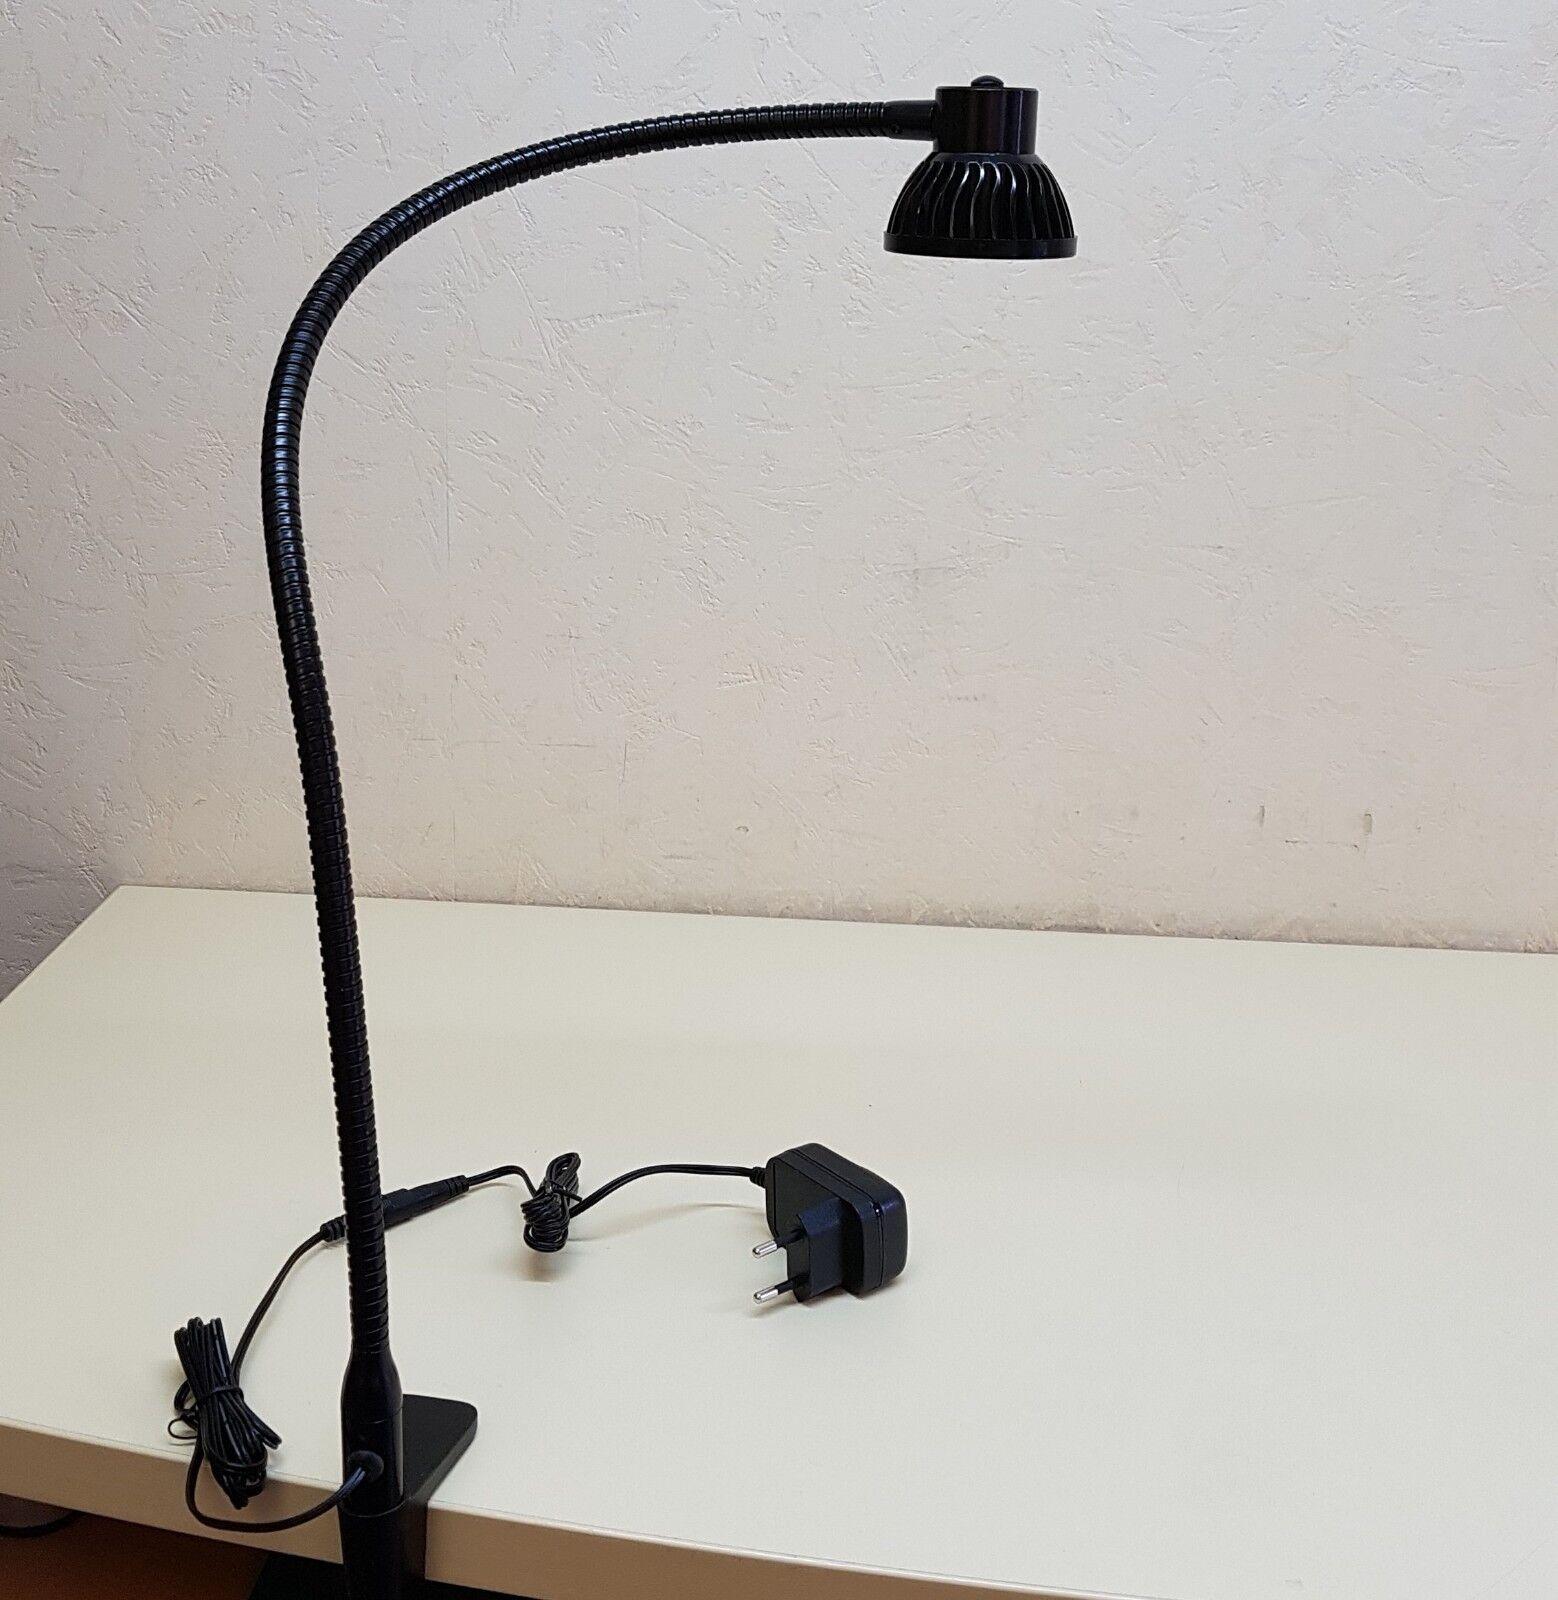 Bindelampe (baugleich Mark Petitjean MP Daylight Lamp´s) LED 31W